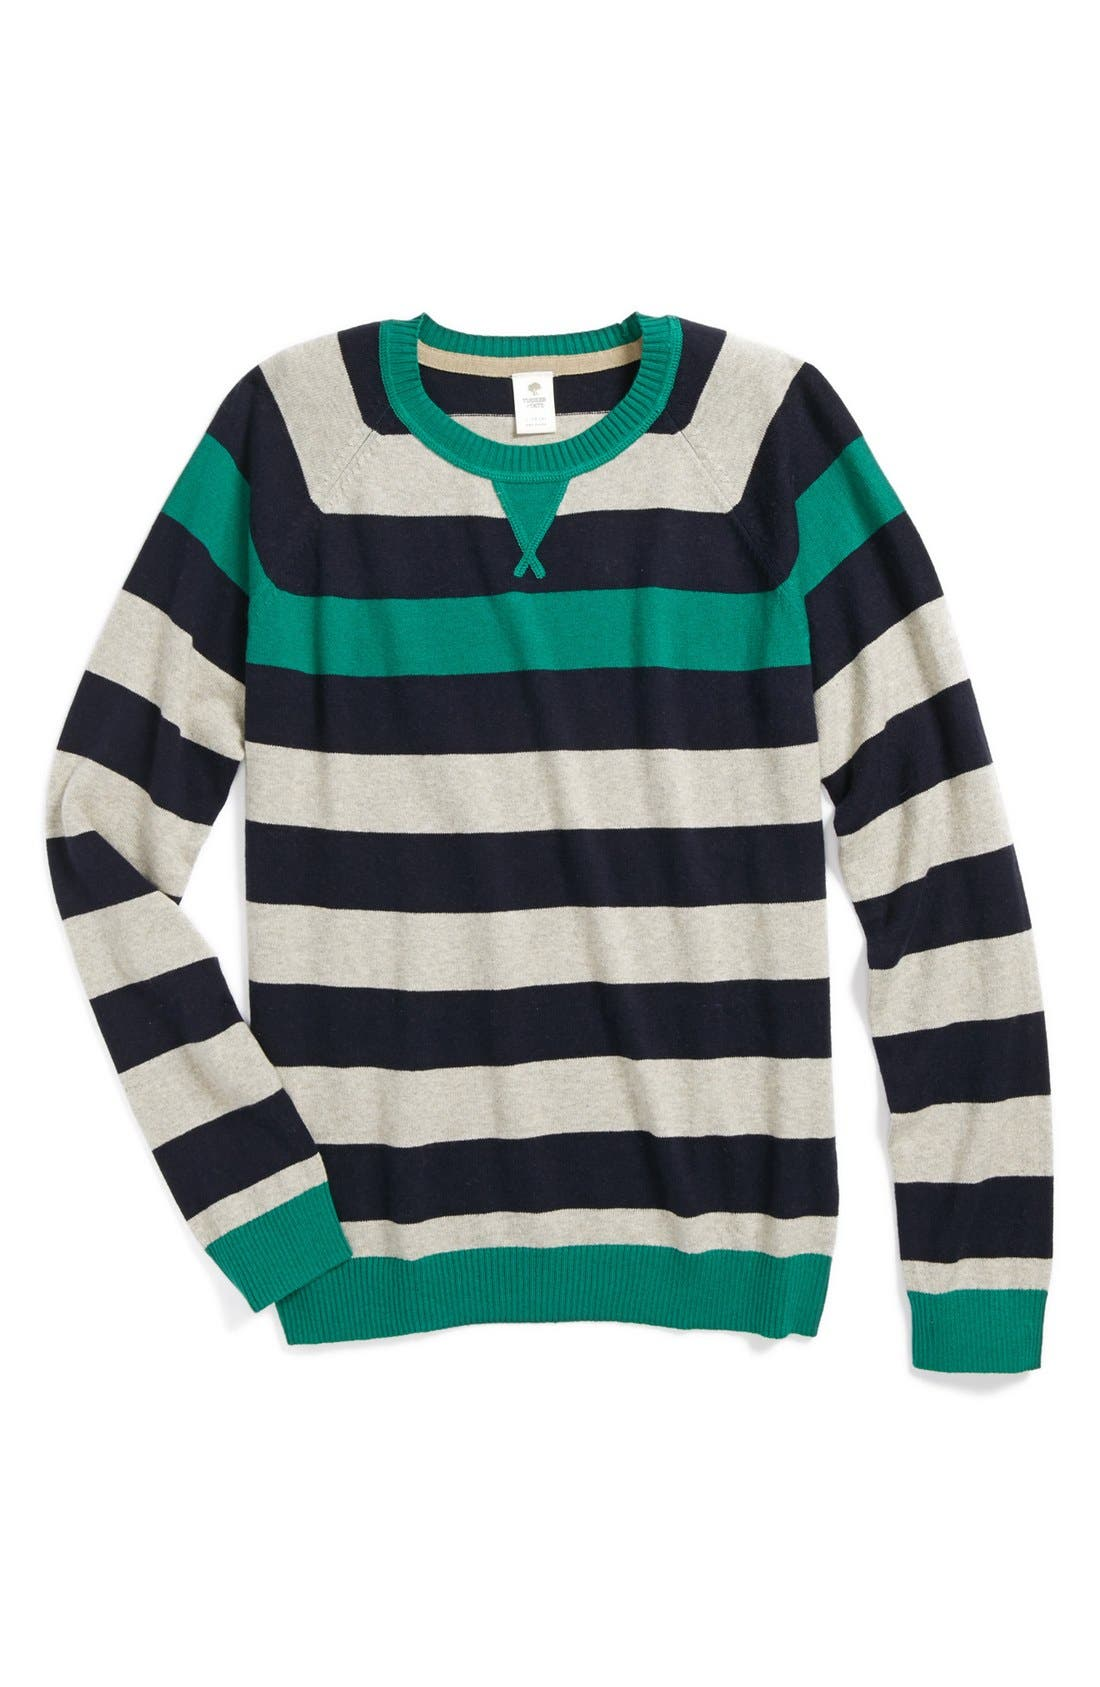 Alternate Image 1 Selected - Tucker + Tate 'Capital Street' Sweater (Big Boys)